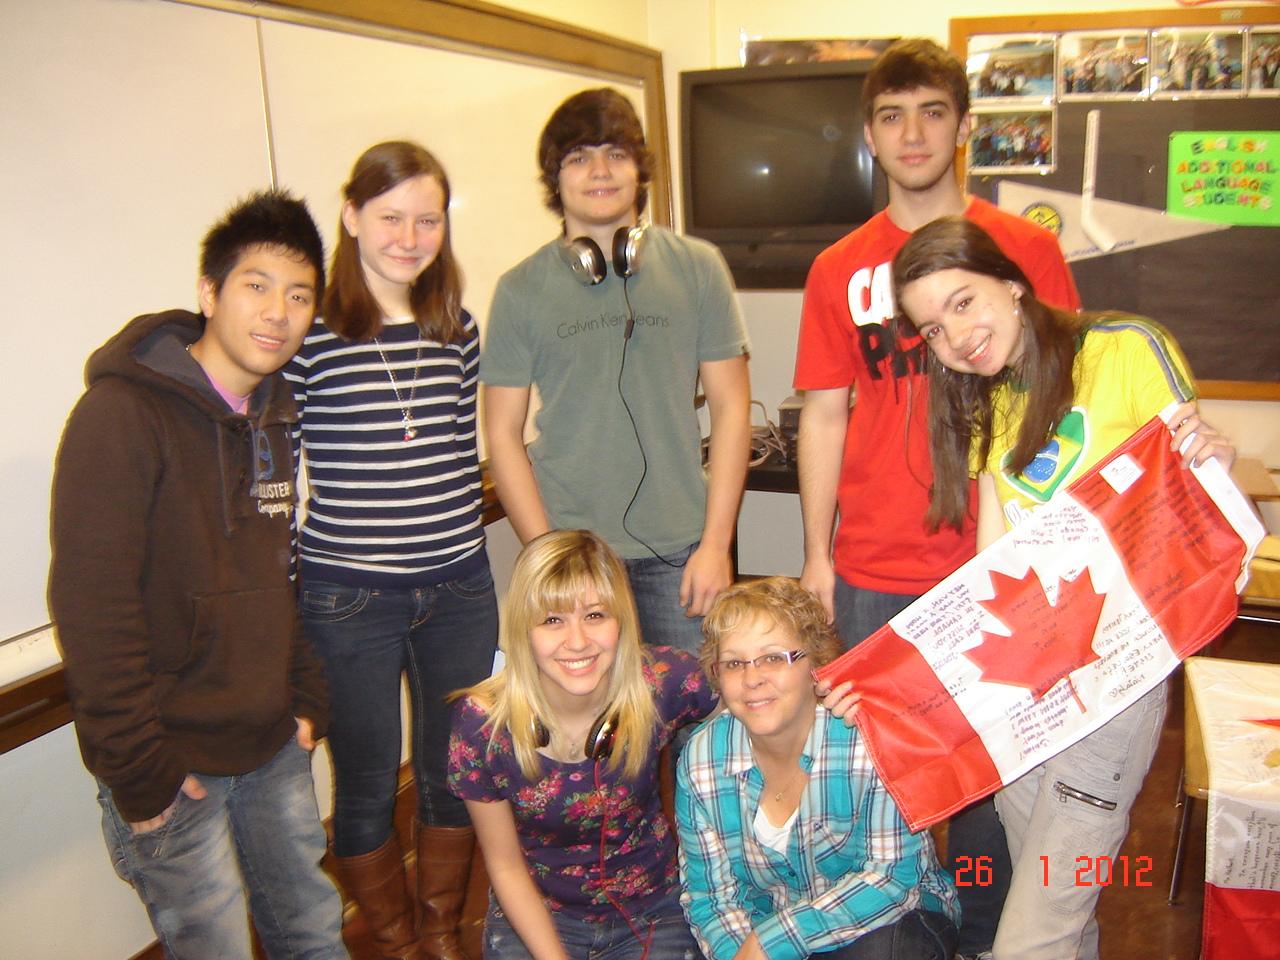 exchange program, Ci, Canada high school, studying abroad, revheim ideas, trip